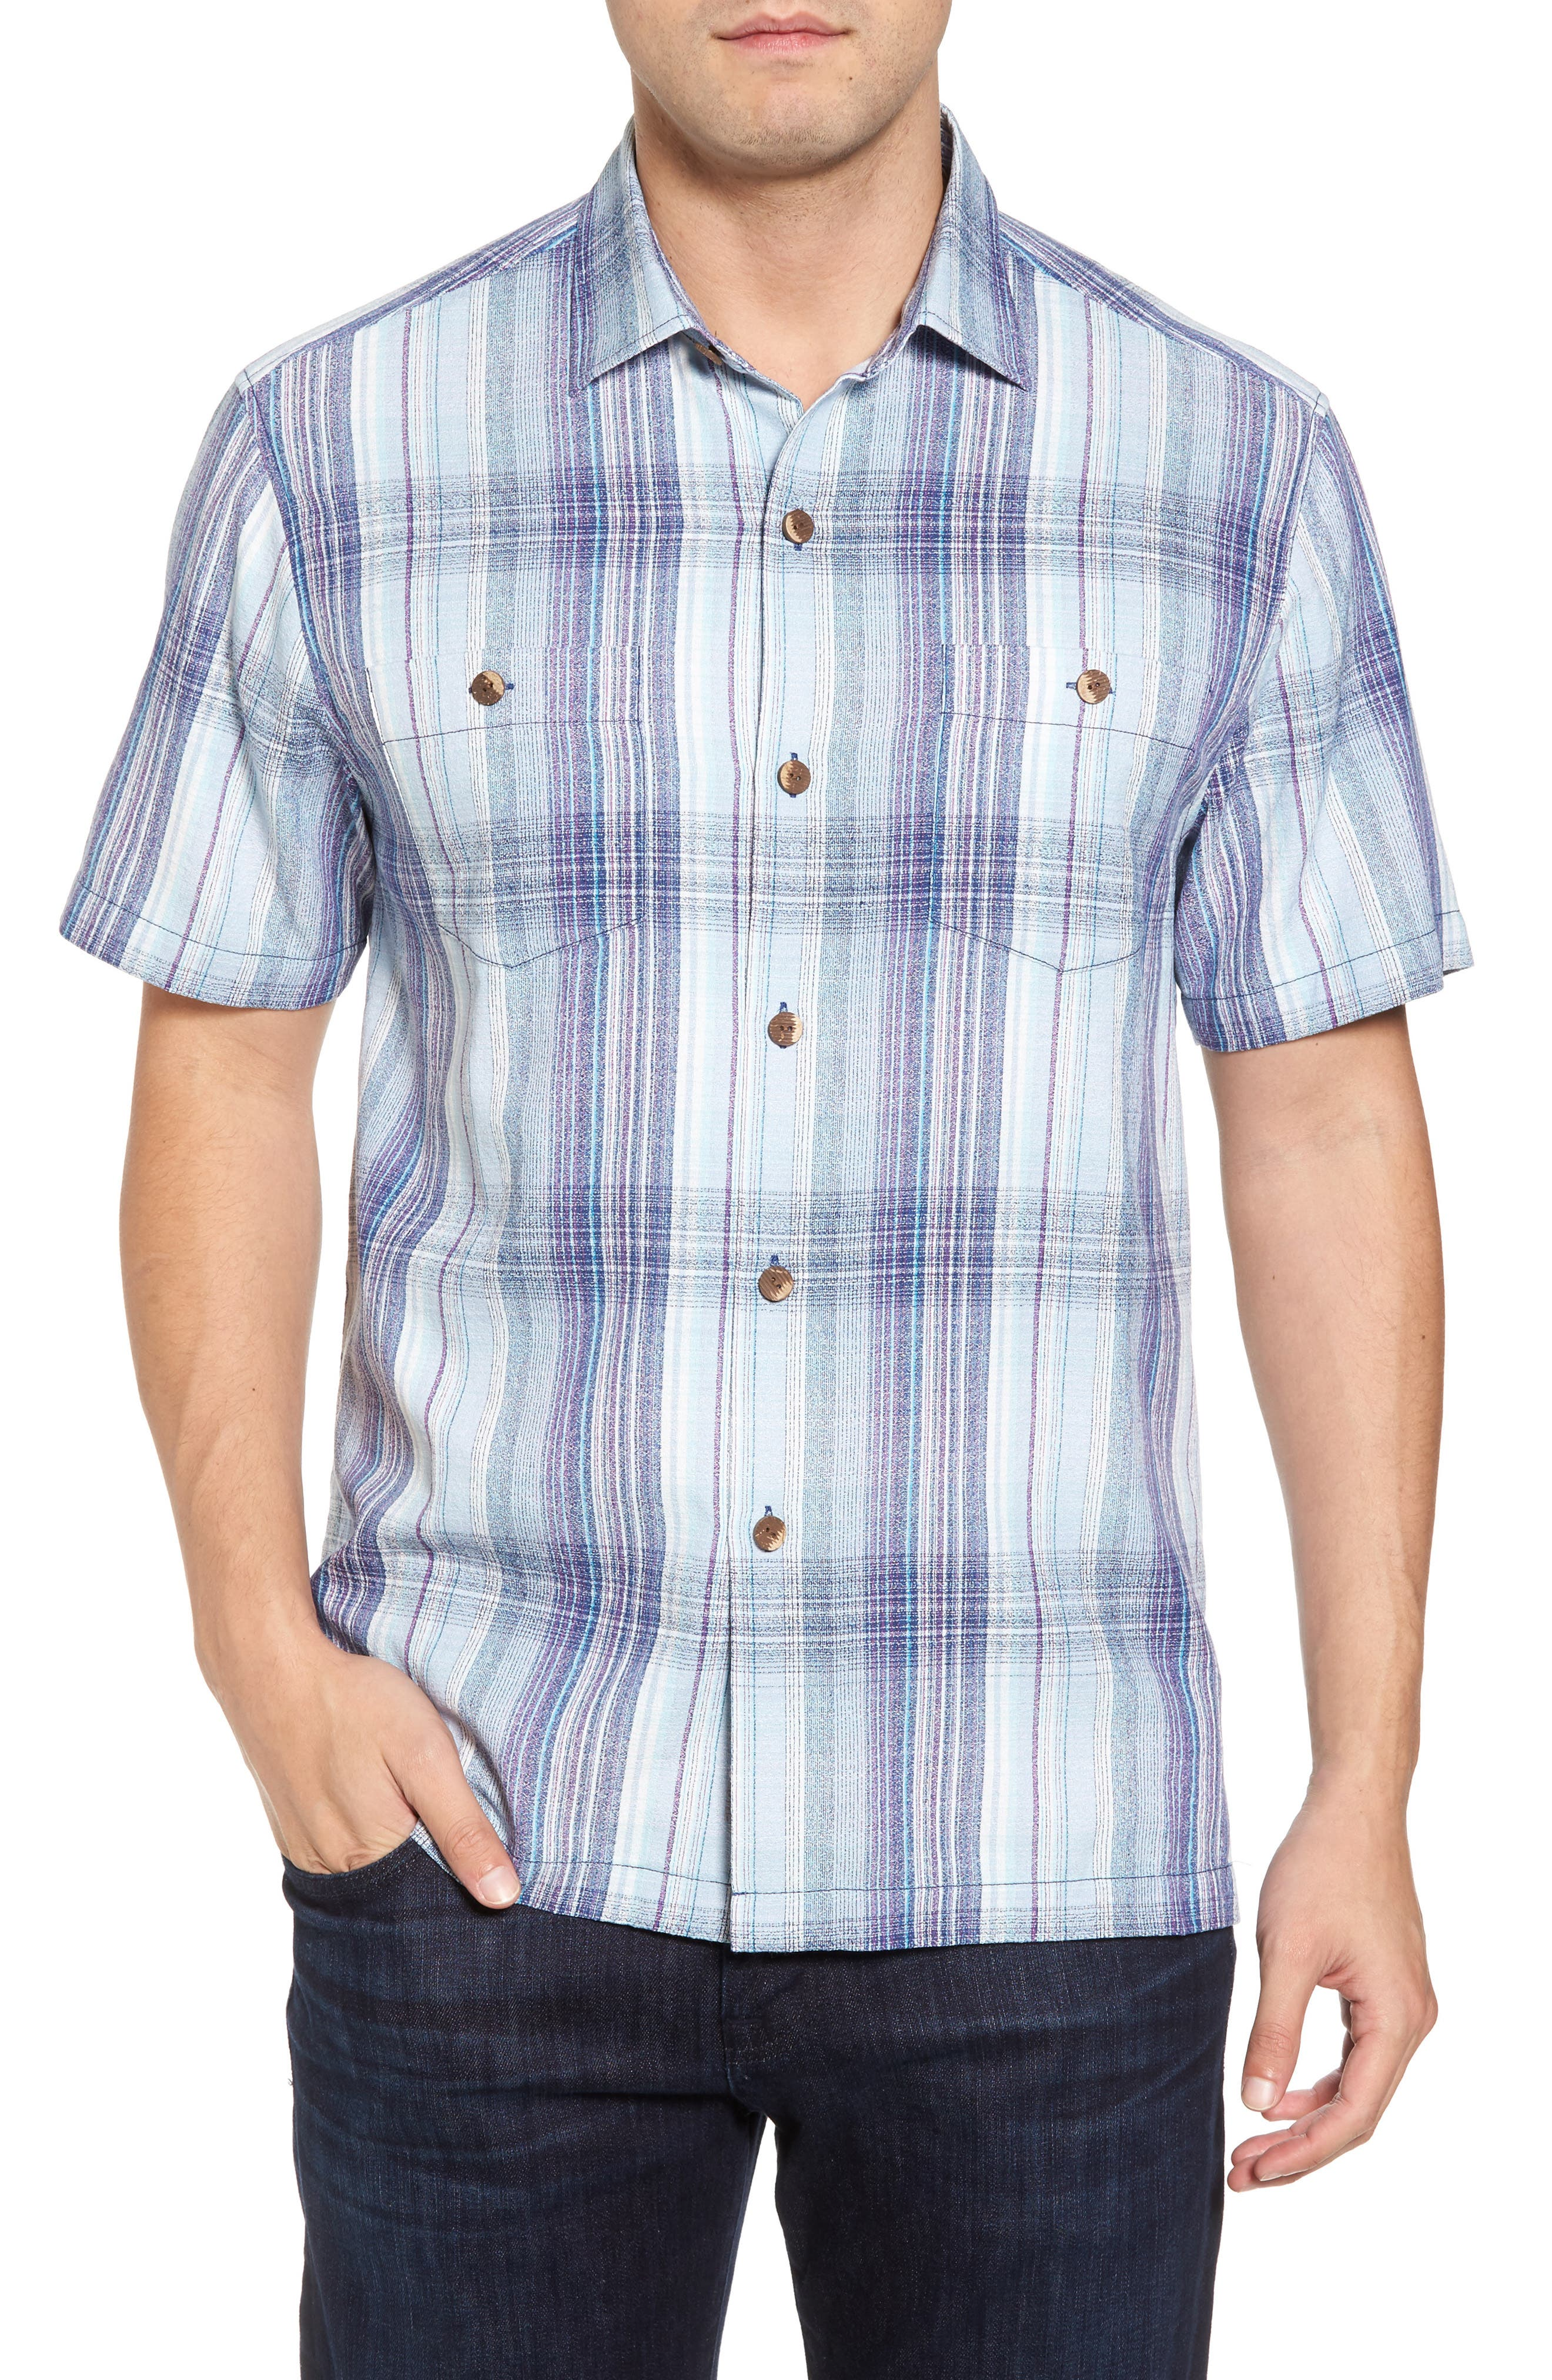 Banyan Cay Regular Fit Silk Blend Sport Shirt,                             Main thumbnail 1, color,                             Dockside Blue